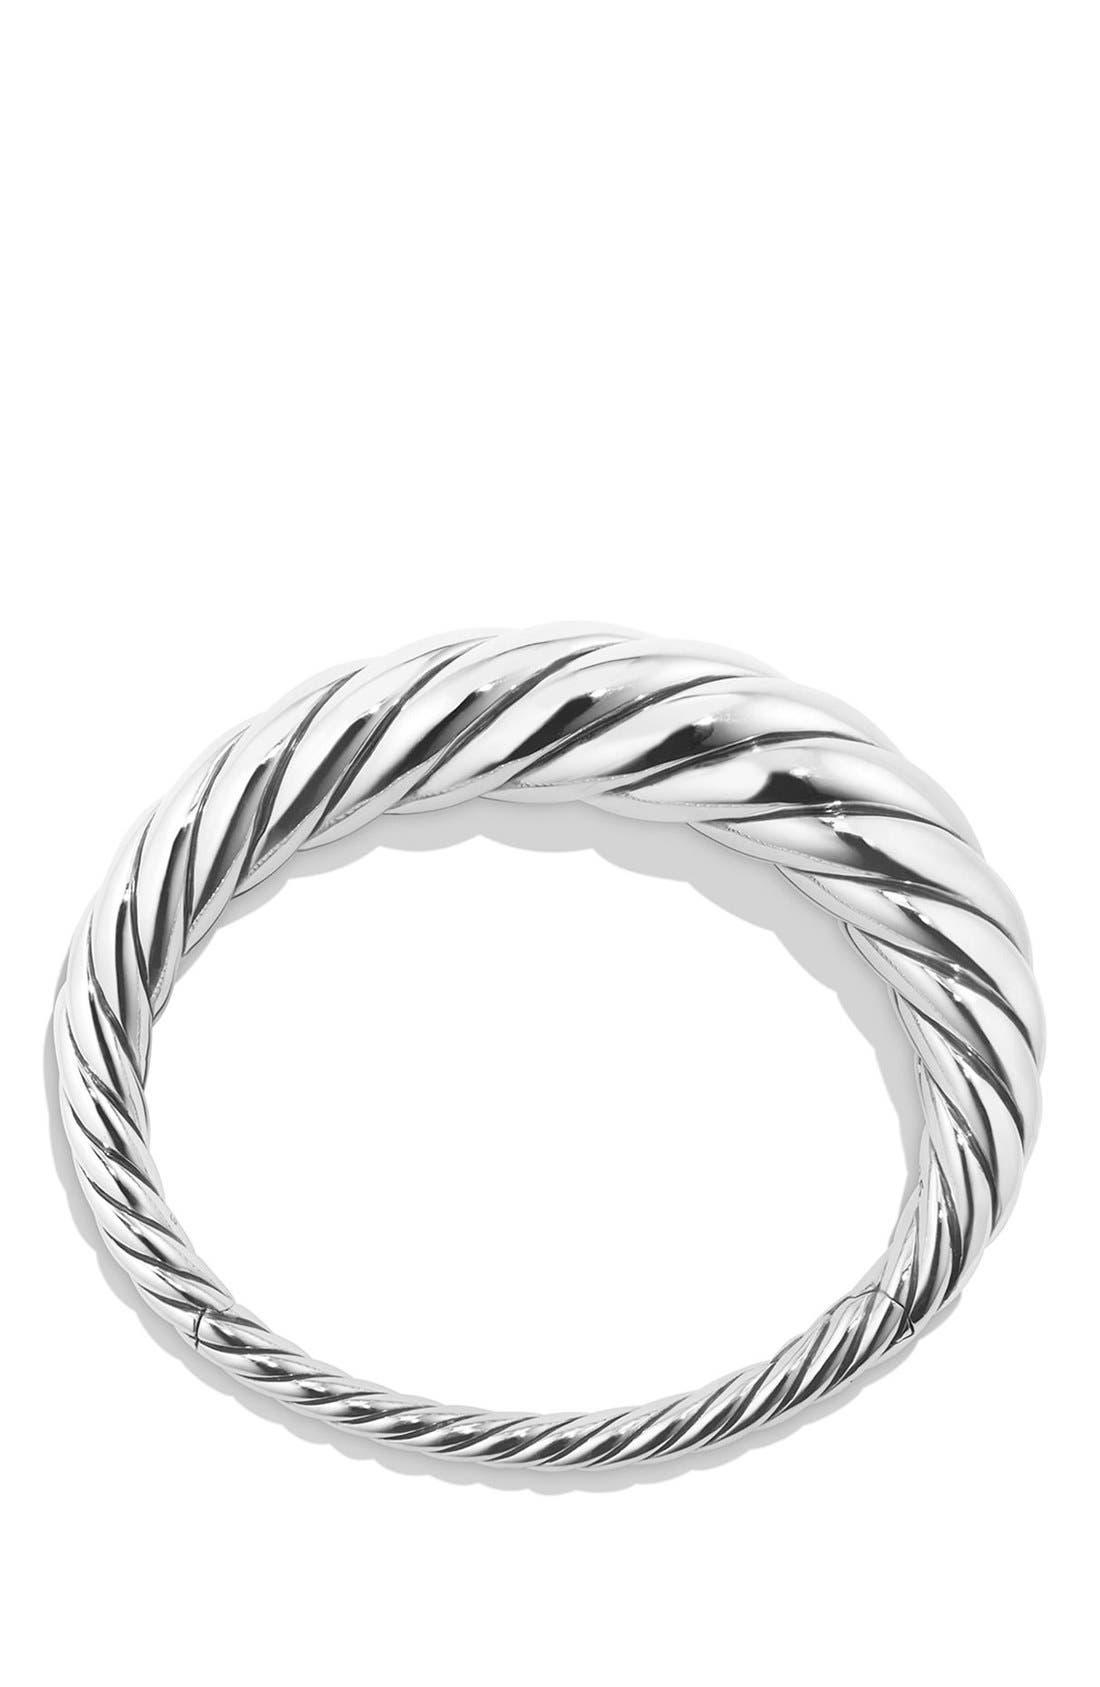 DAVID YURMAN, 'Pure Form' Cable Bracelet, Alternate thumbnail 2, color, SILVER